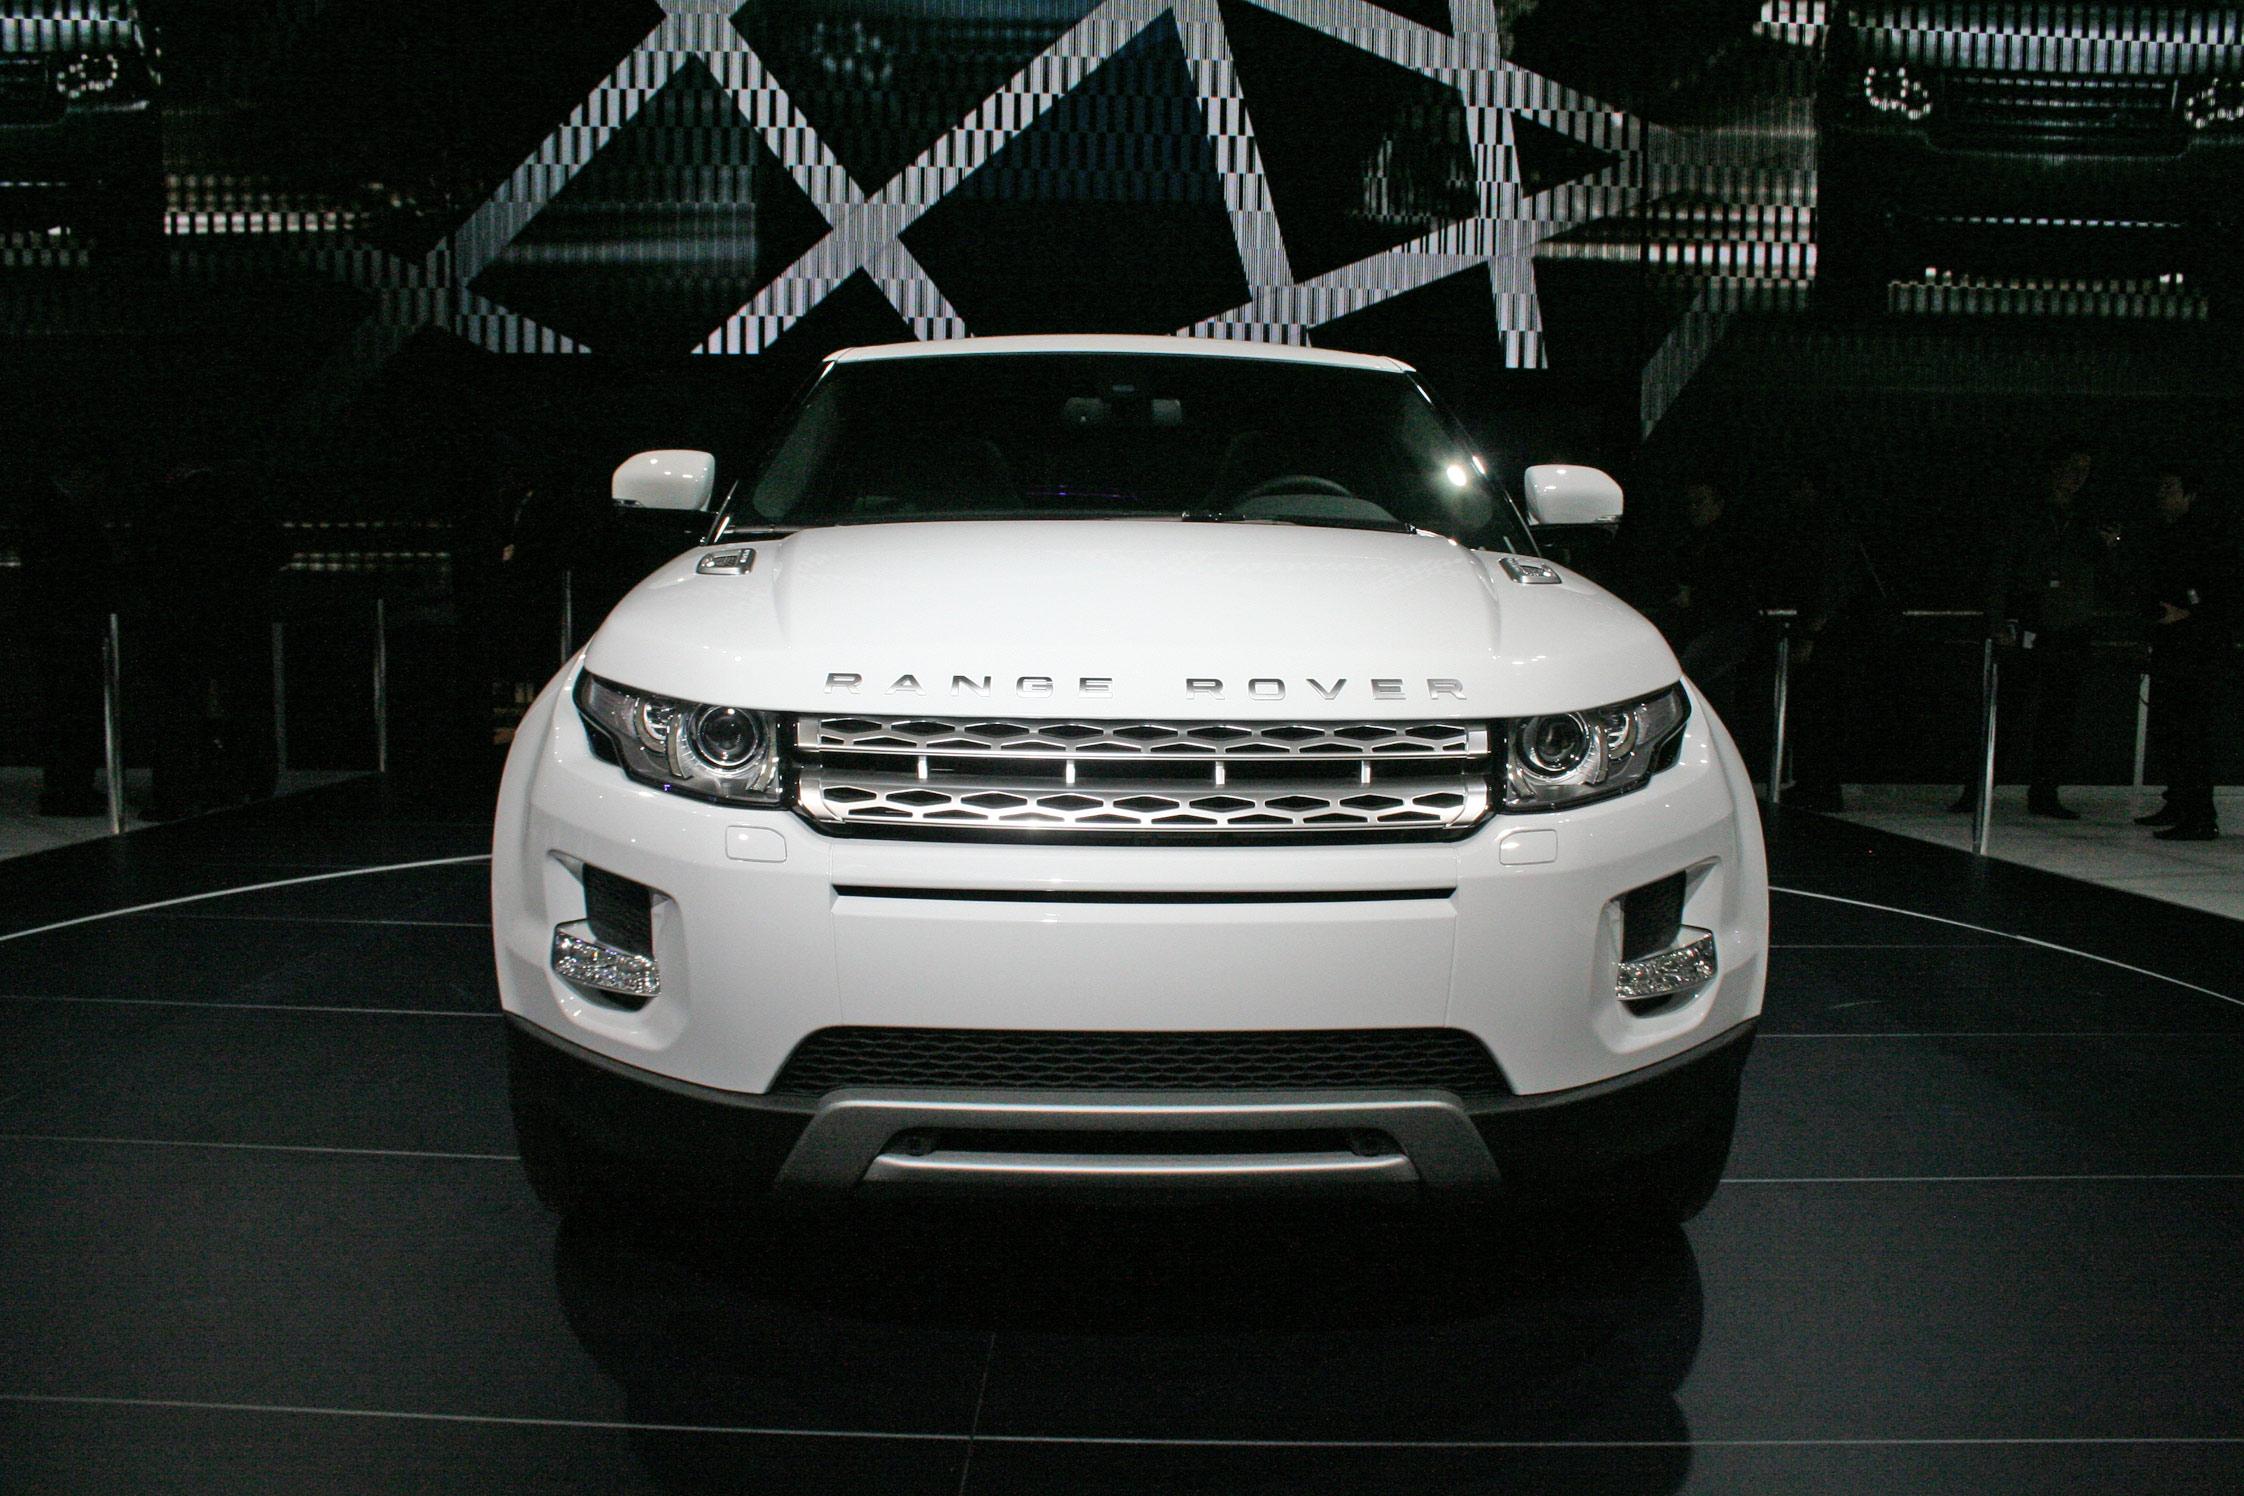 land rover range rover evoque mondial automobile de paris 2010. Black Bedroom Furniture Sets. Home Design Ideas